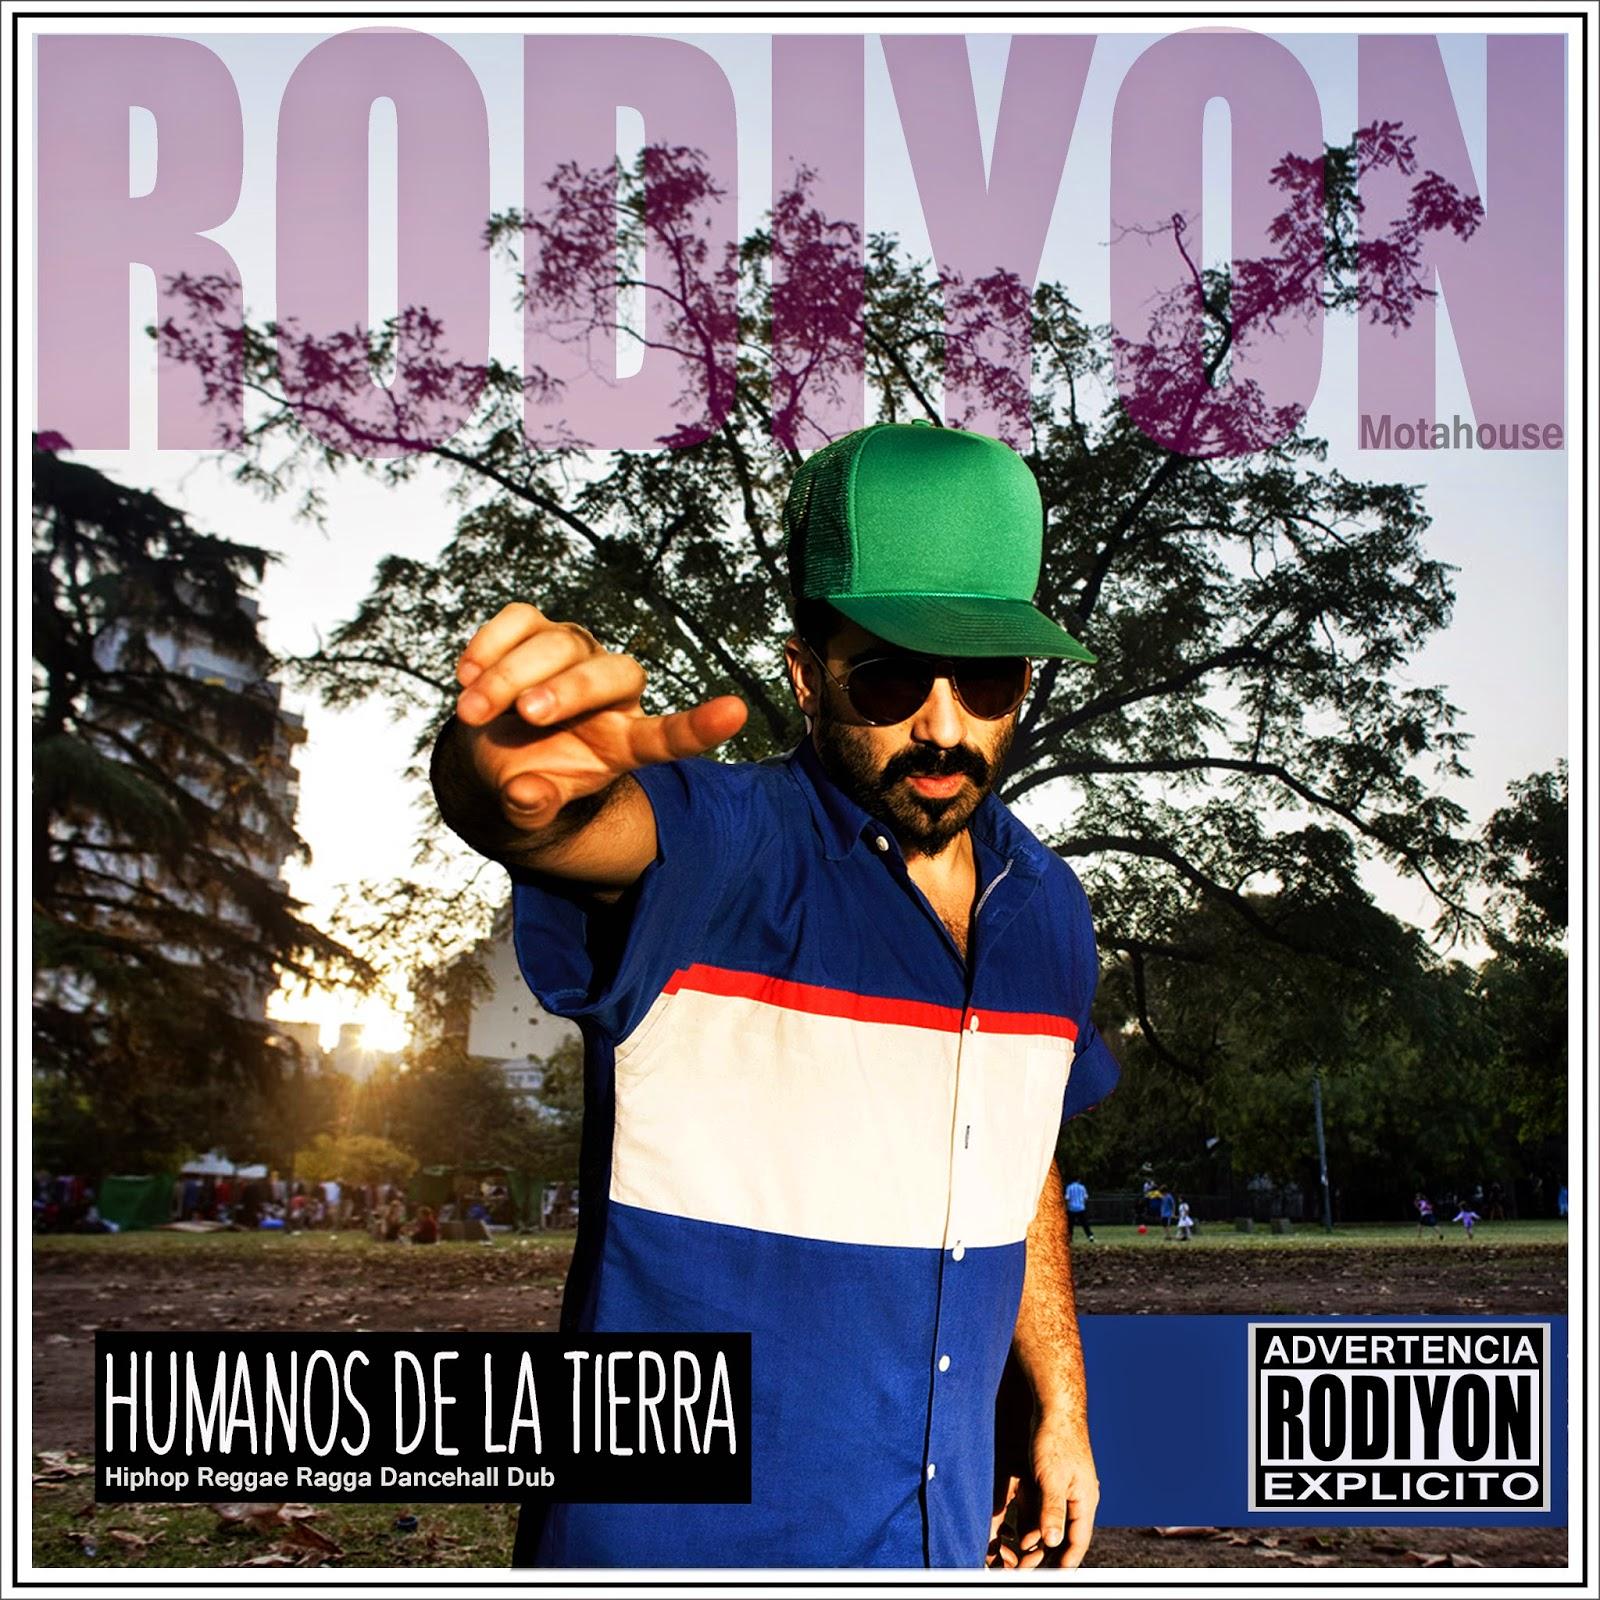 http://rodiyonmotahouse.bandcamp.com/album/humanos-de-la-tierra